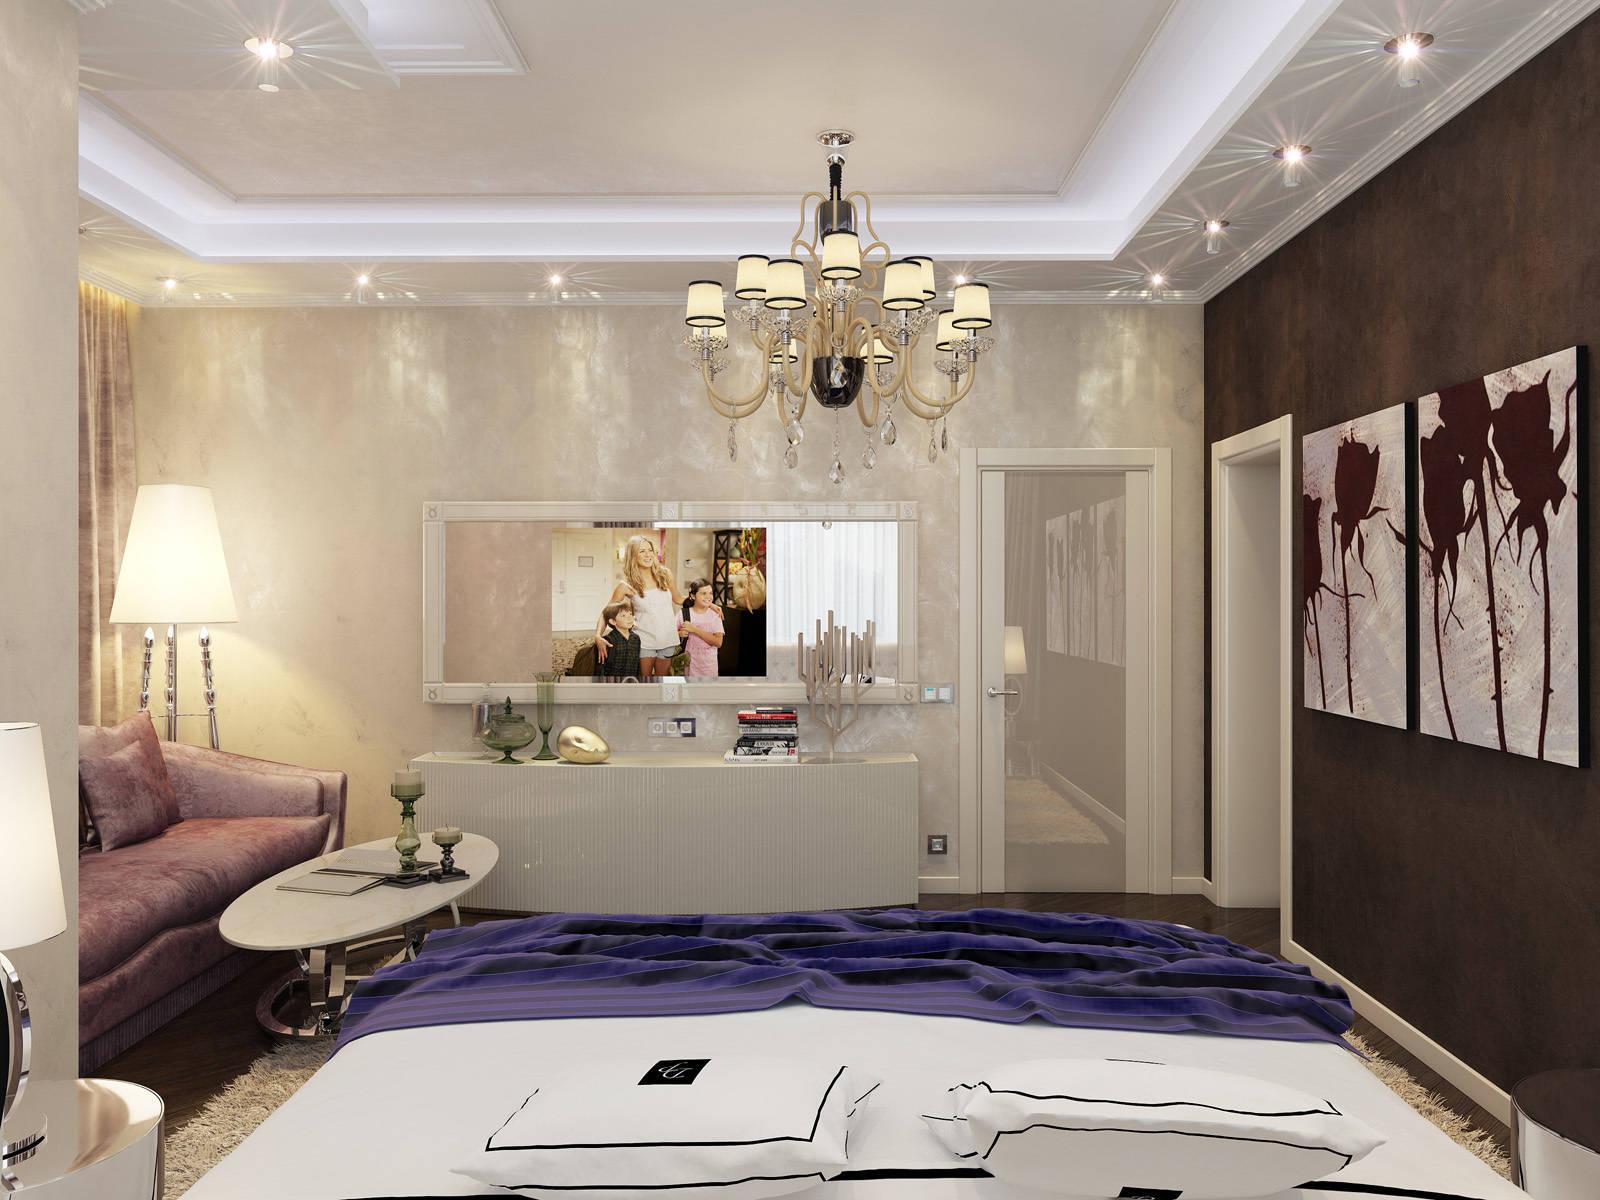 Спальня в доме. Чистые ключи.